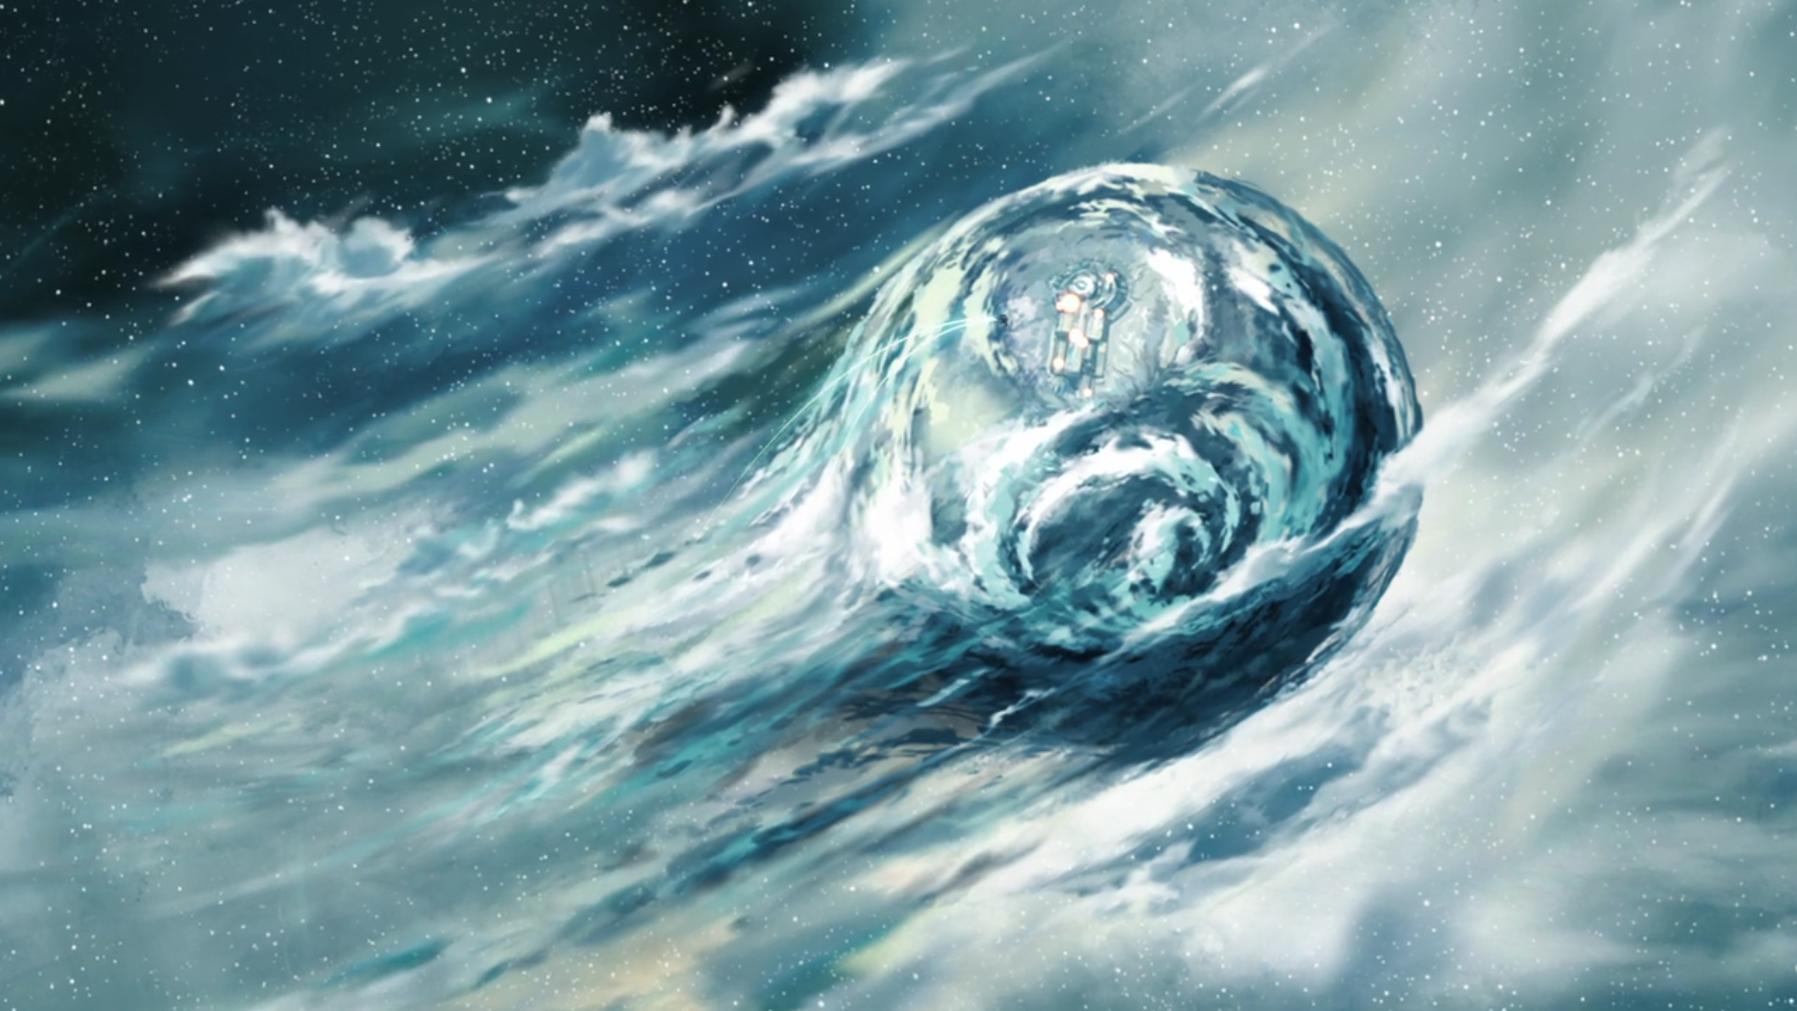 Kraydah's moon